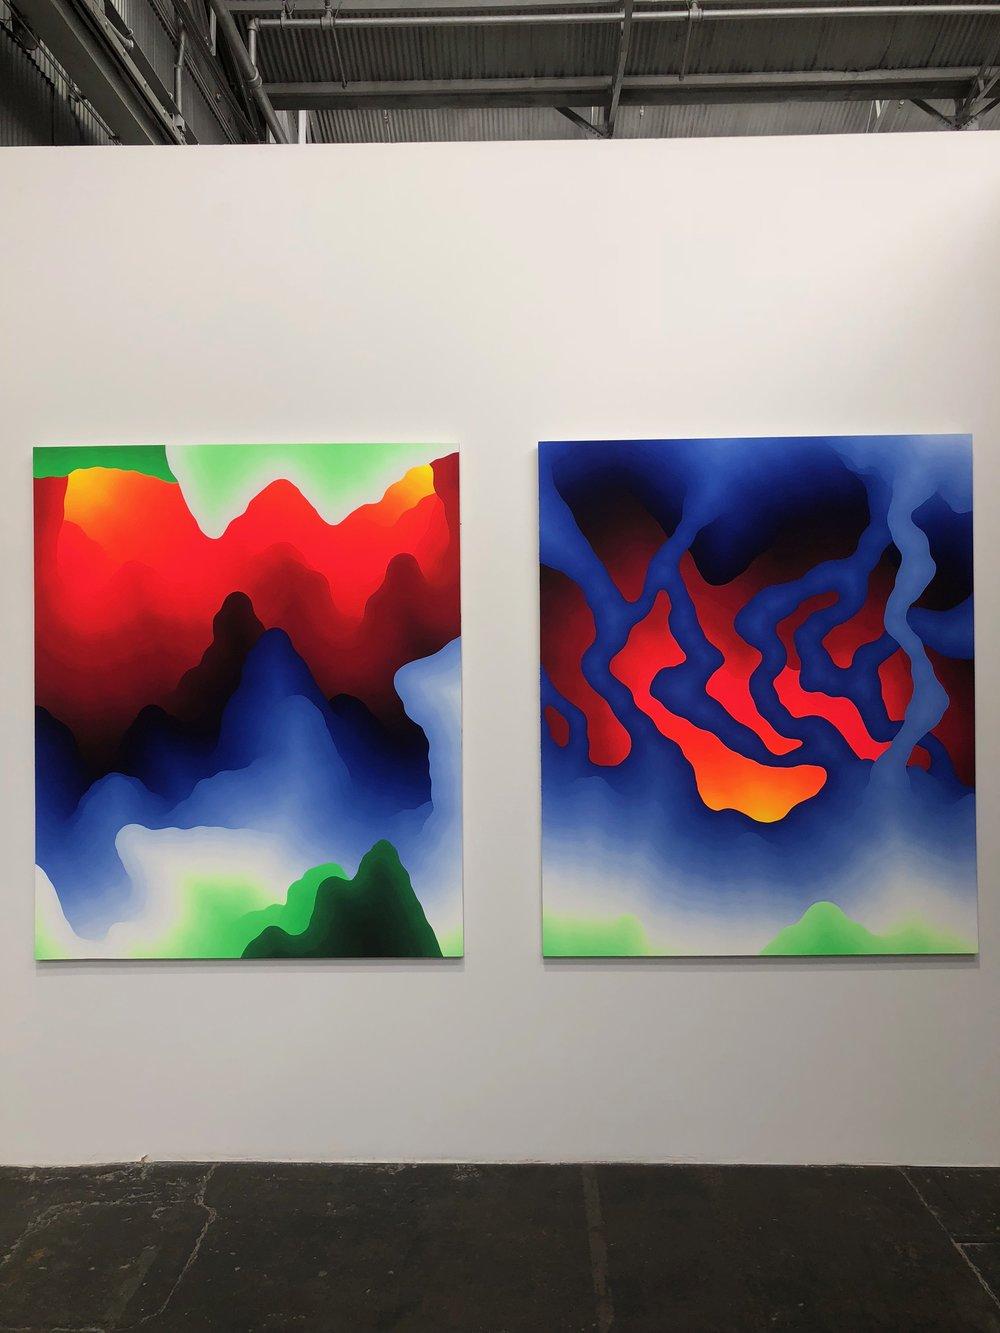 Untitled works by Sam Friedman.